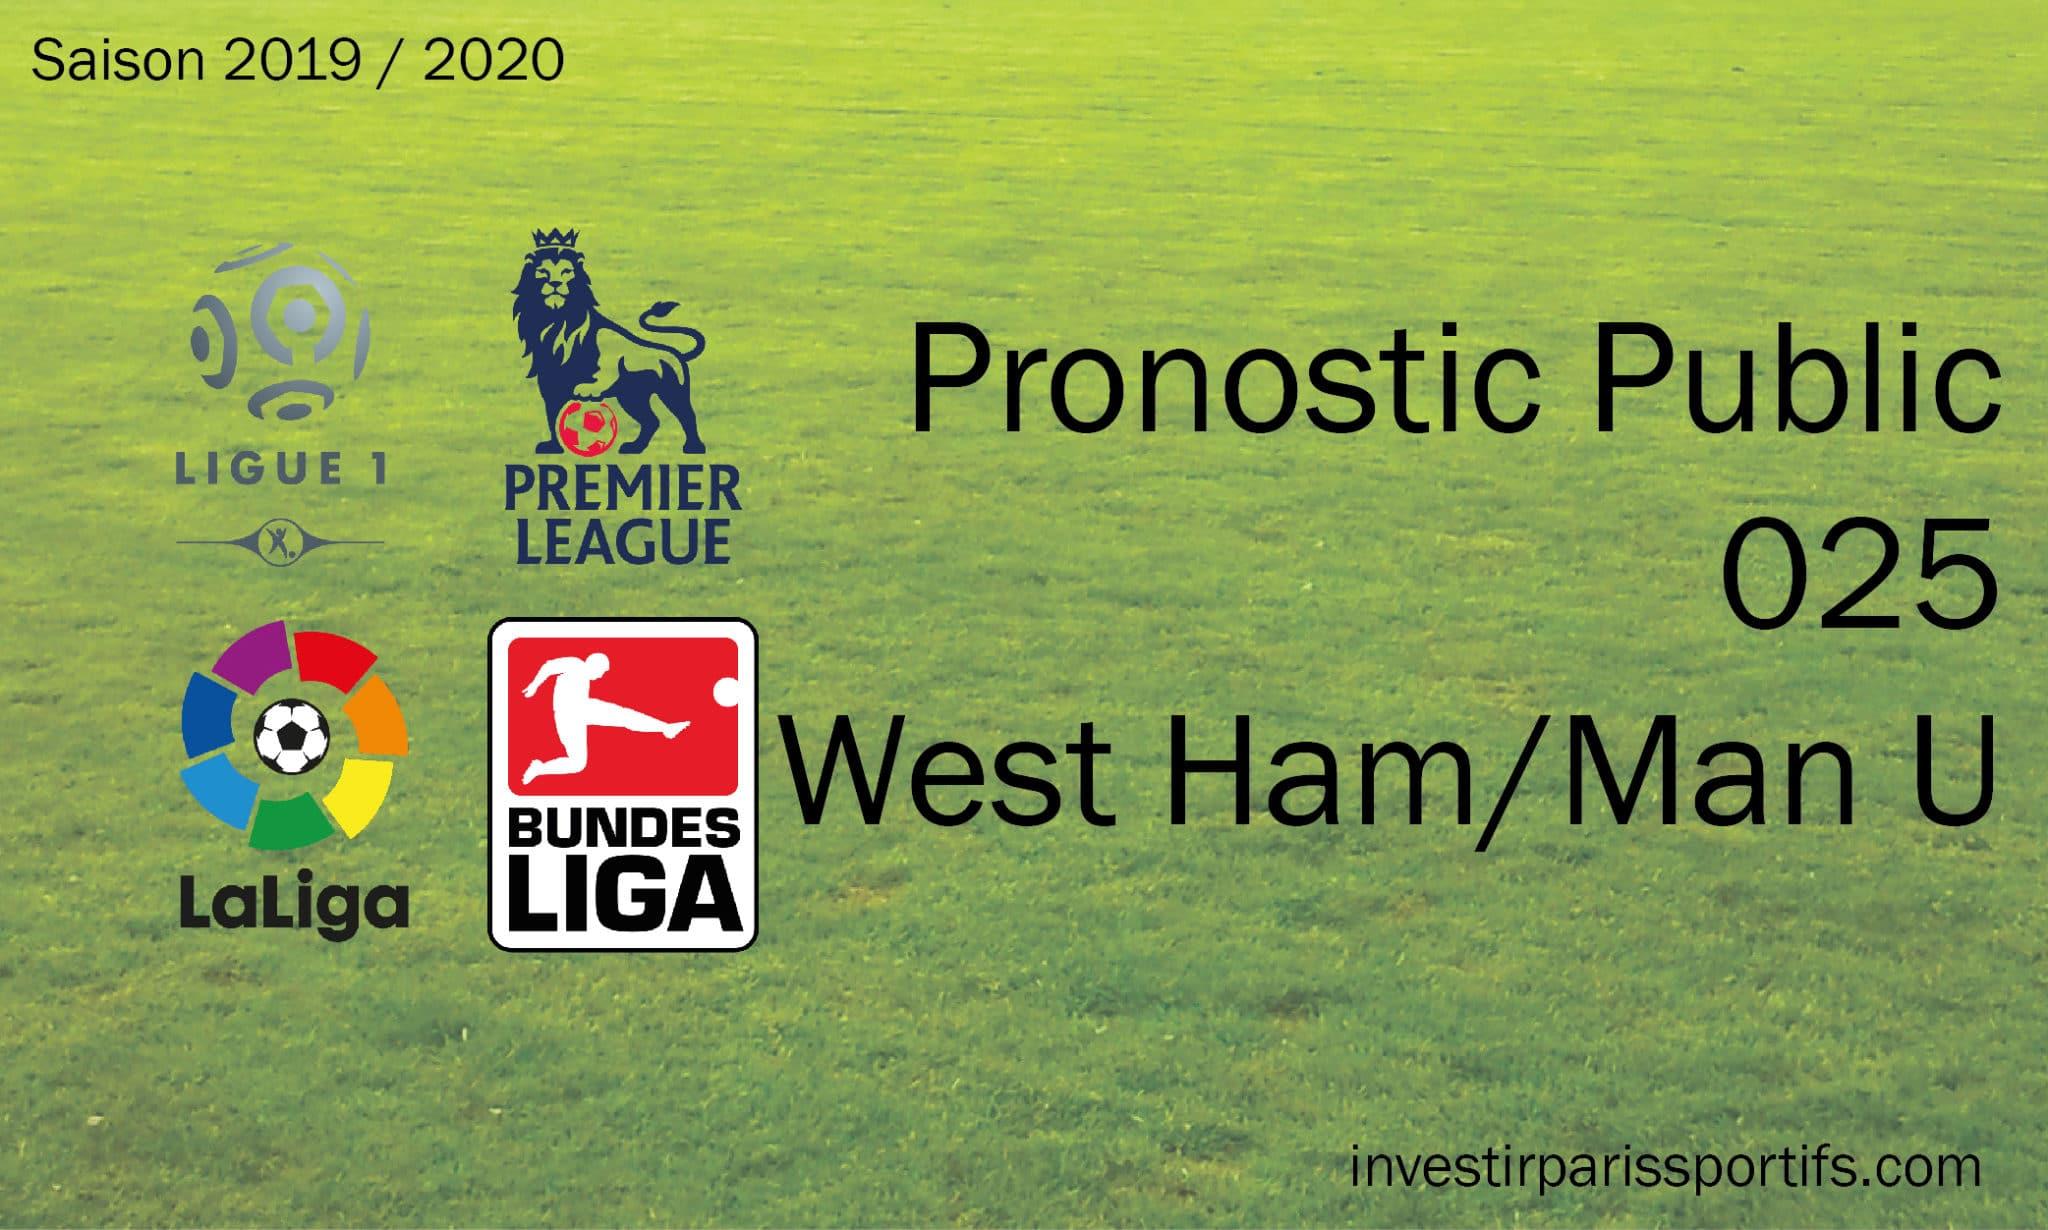 Pronostic 025 – West Ham : Manchester United – PL